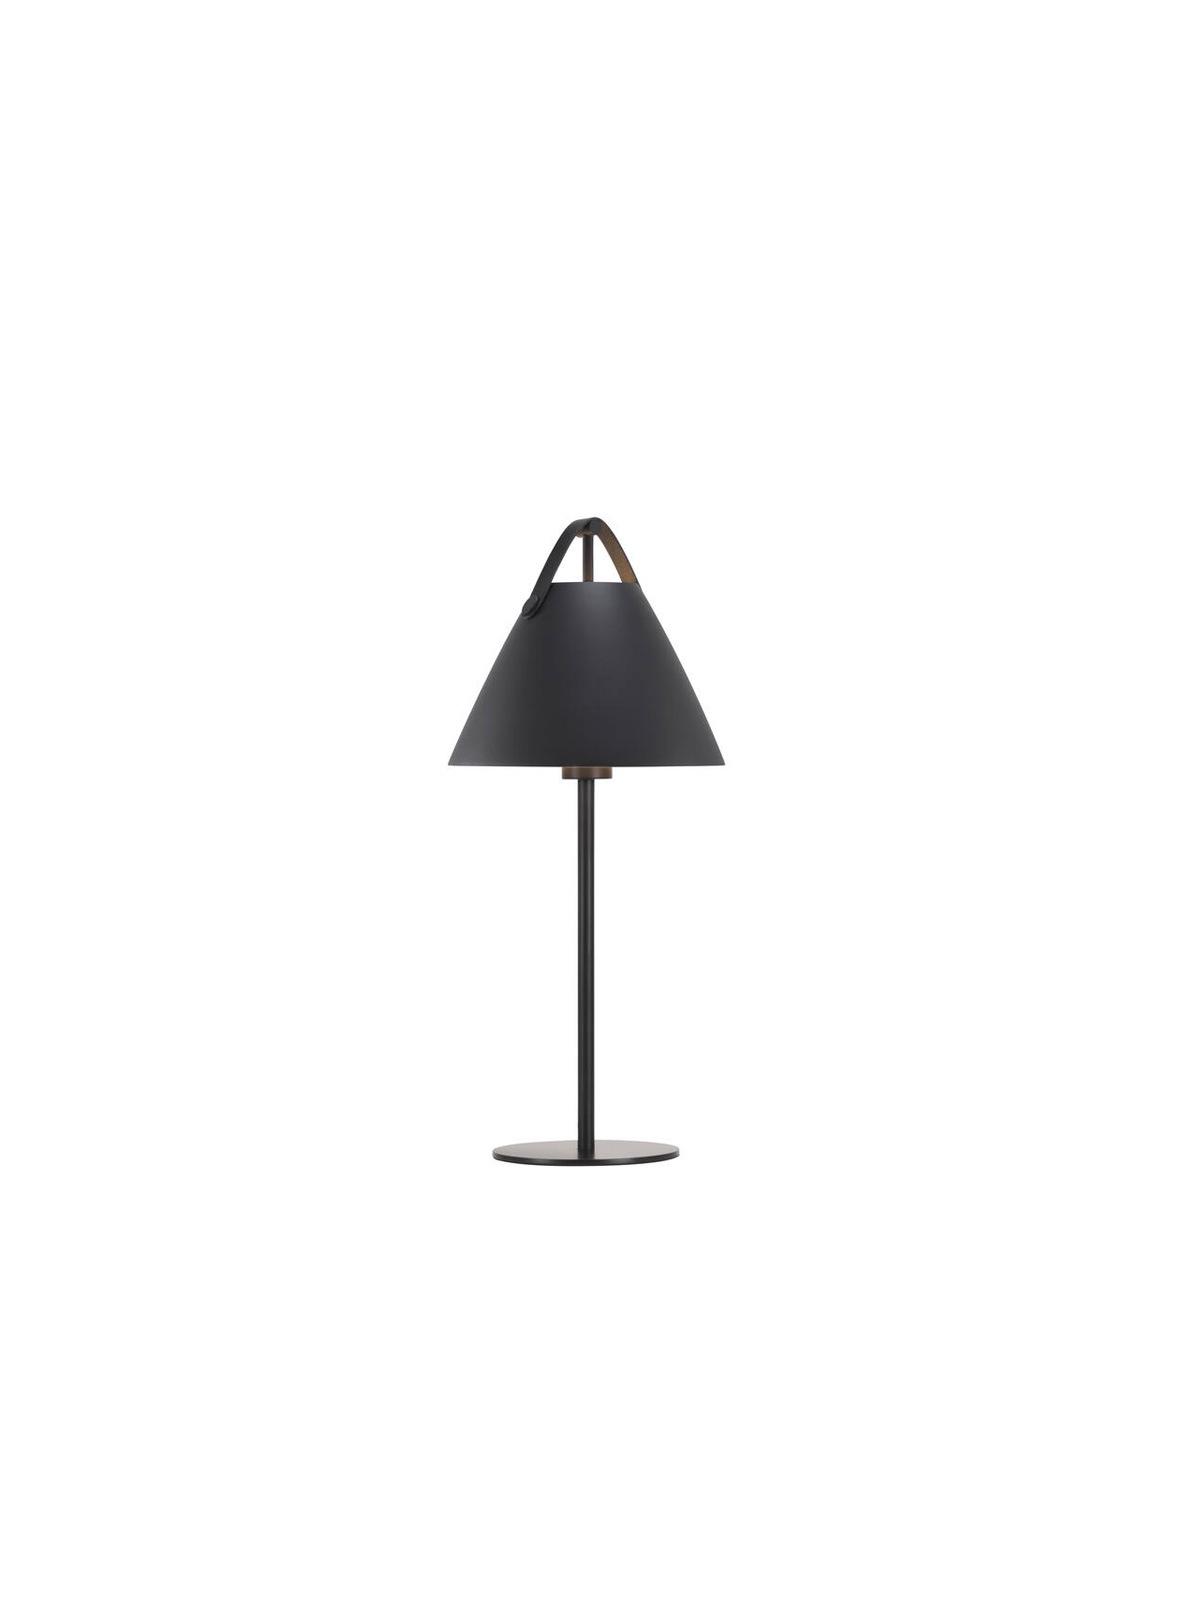 Design for the People Strap Table Tischleuchte Designort Lampen Berlin